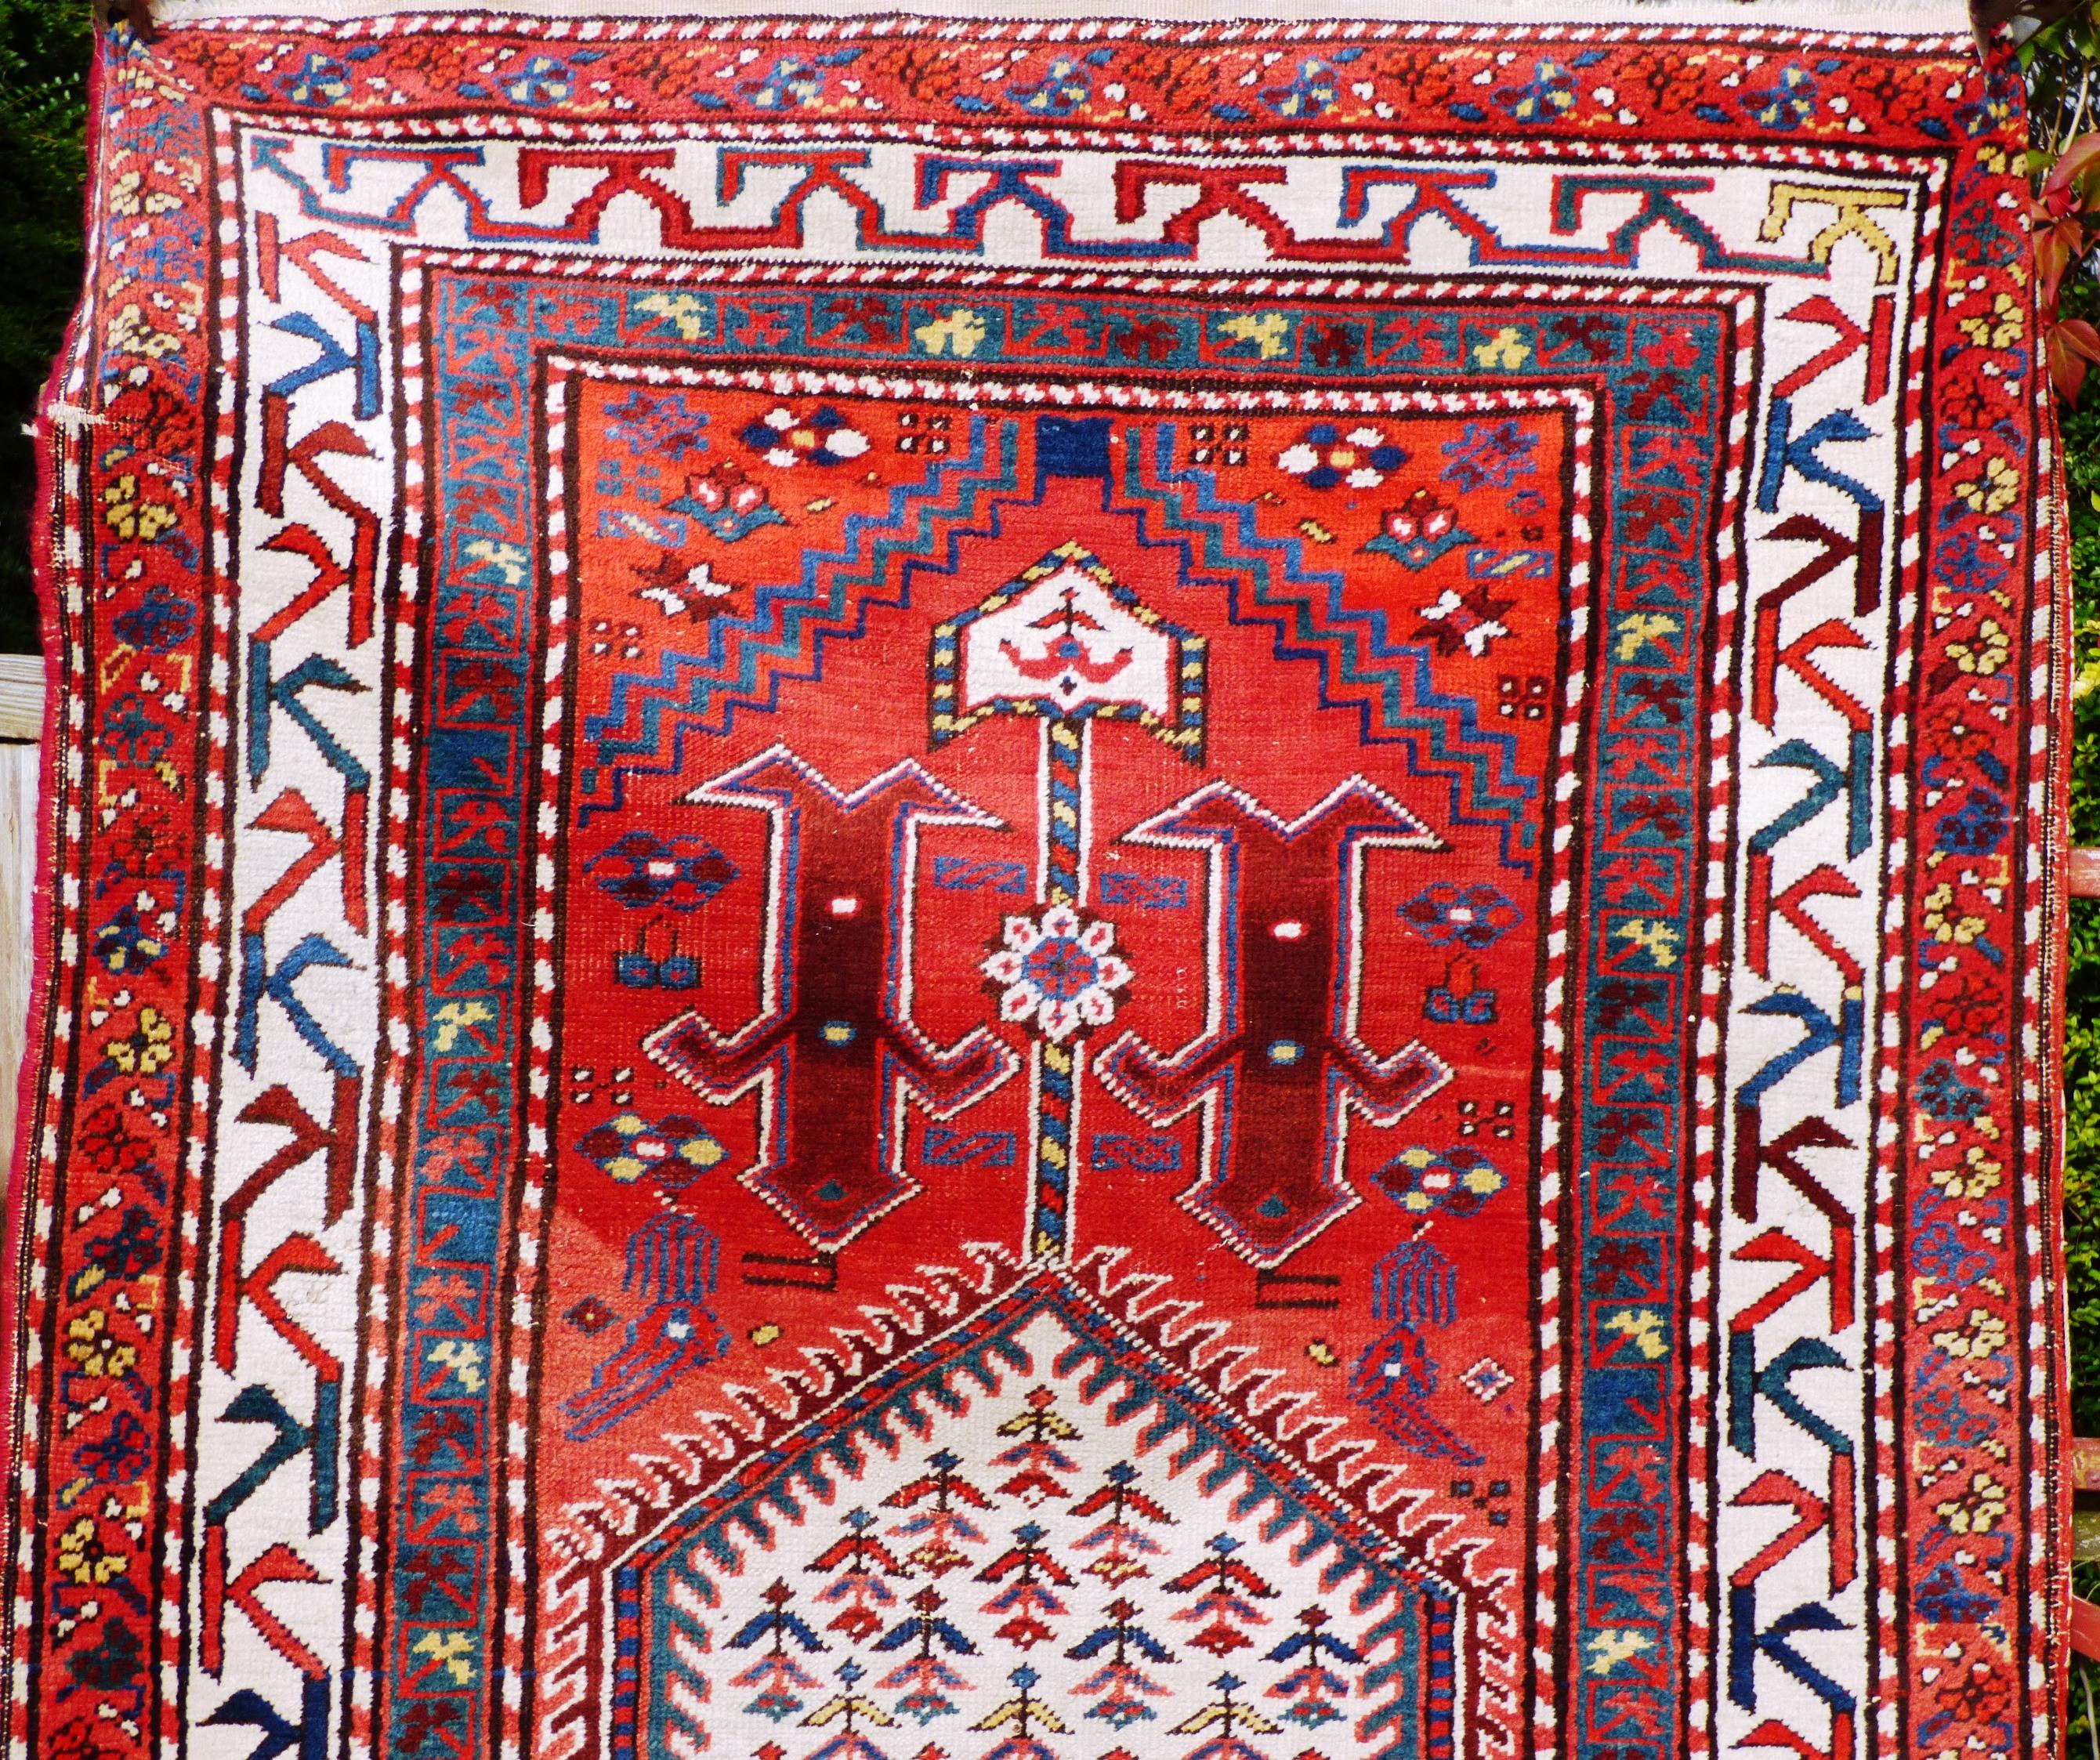 London Antique Textiles Amp Tribal Art Fair Dominic Orr